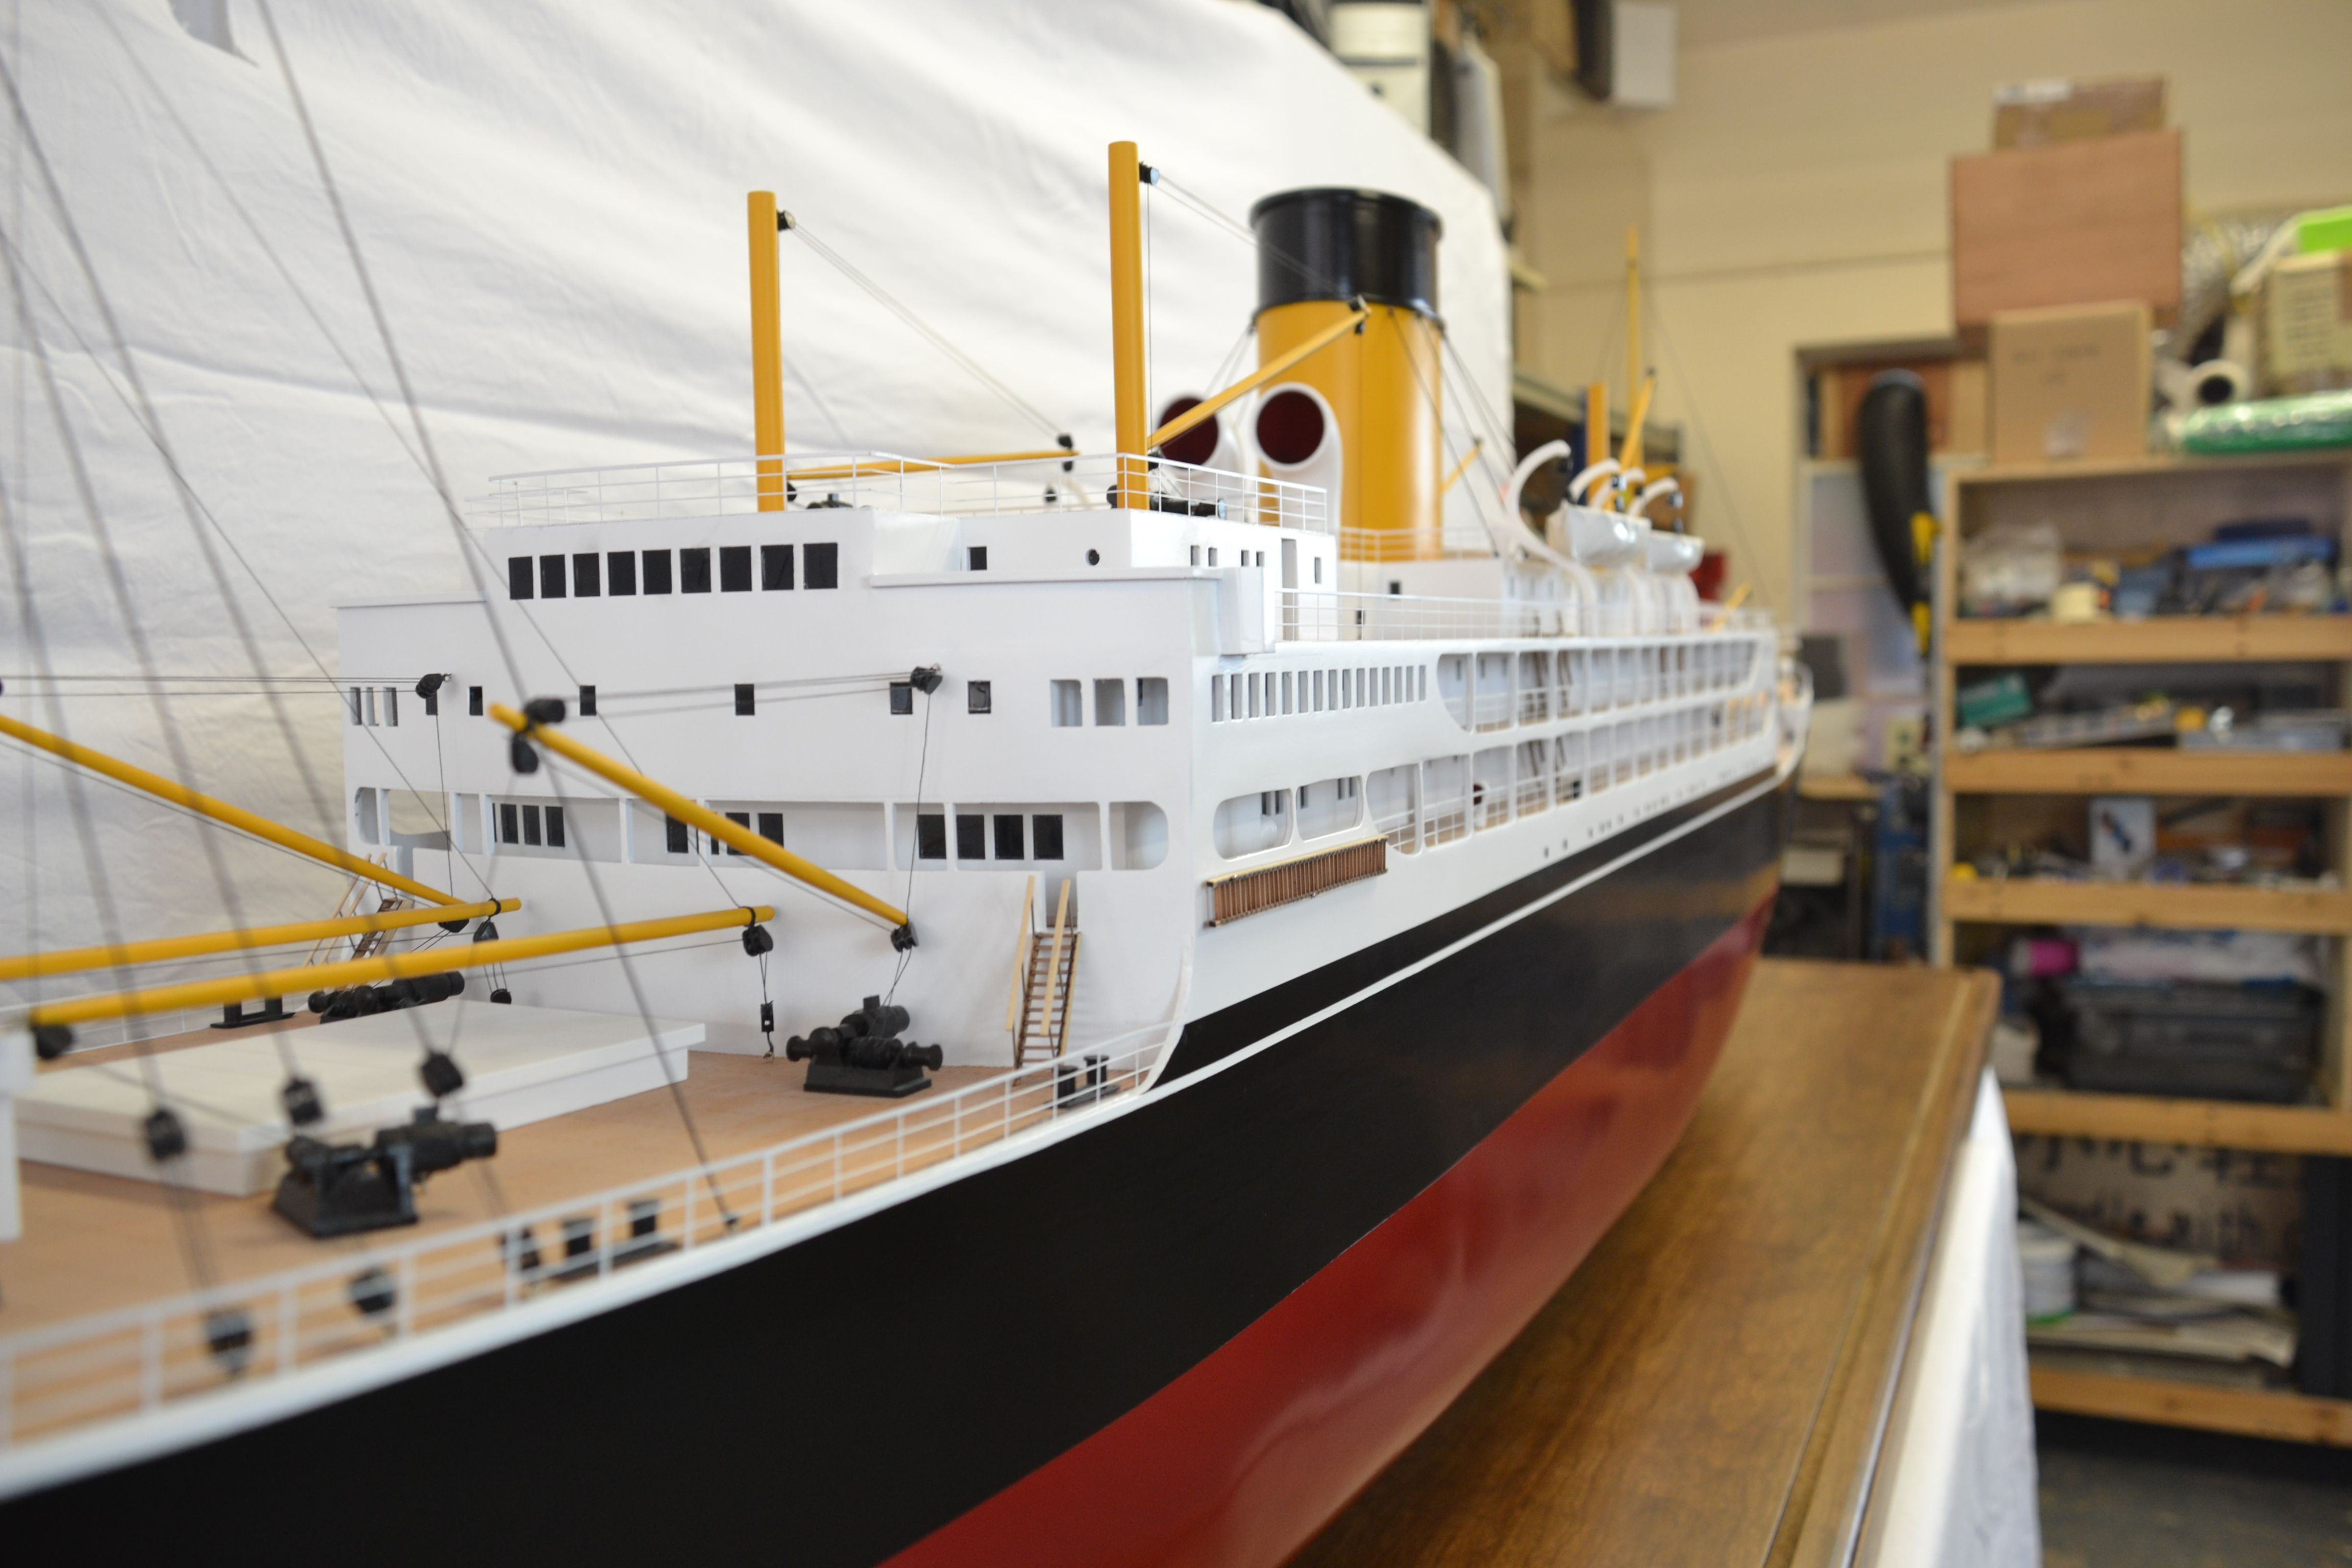 2209-12965-SS-Corinthic-Model-Ship